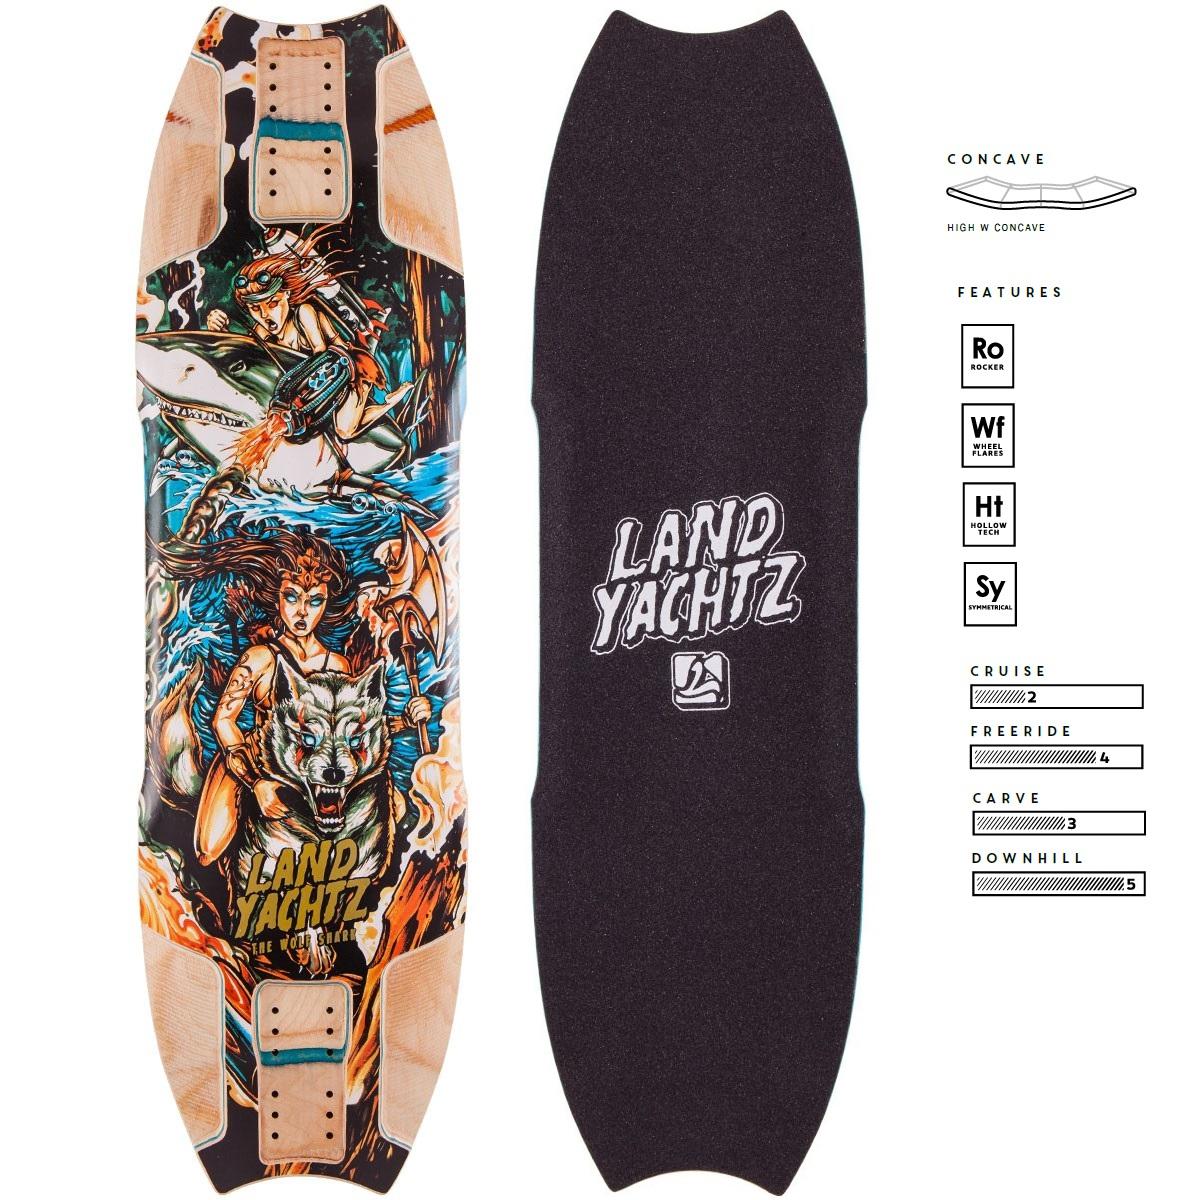 "Landyachtz Wolf Shark longboard deska 35,8"" 15/16 Doprava zdarma"